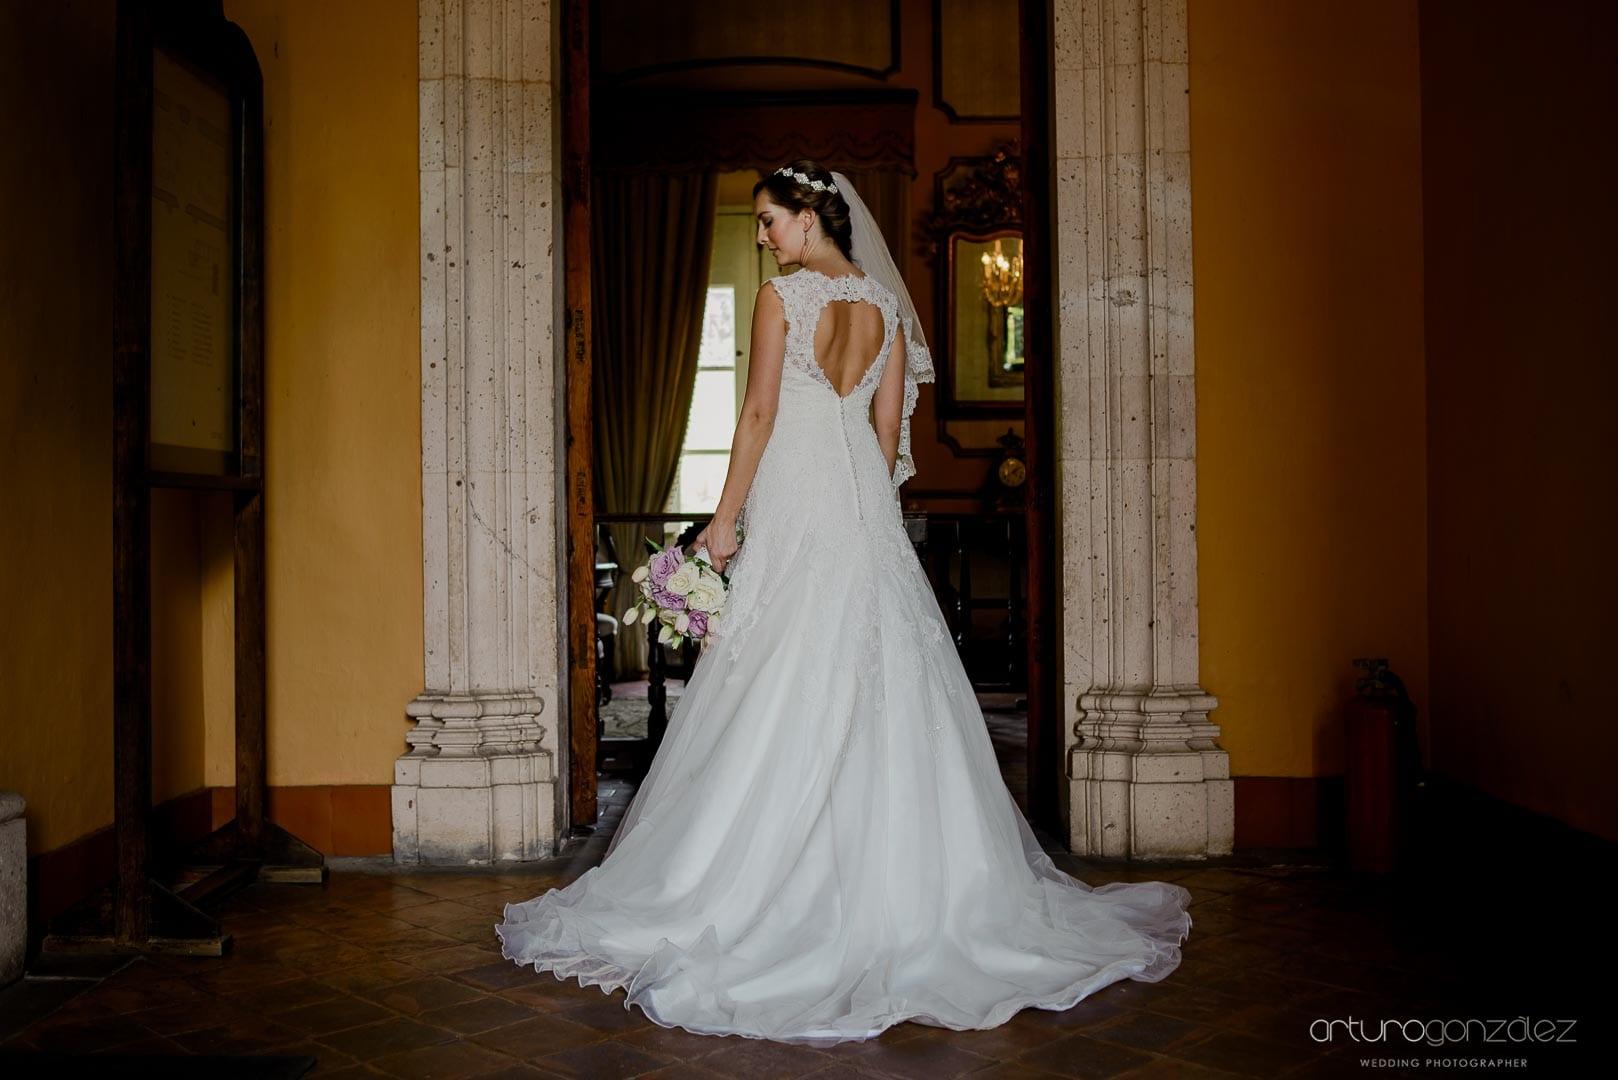 fotografo-de-bodas-en-guanajuato-36